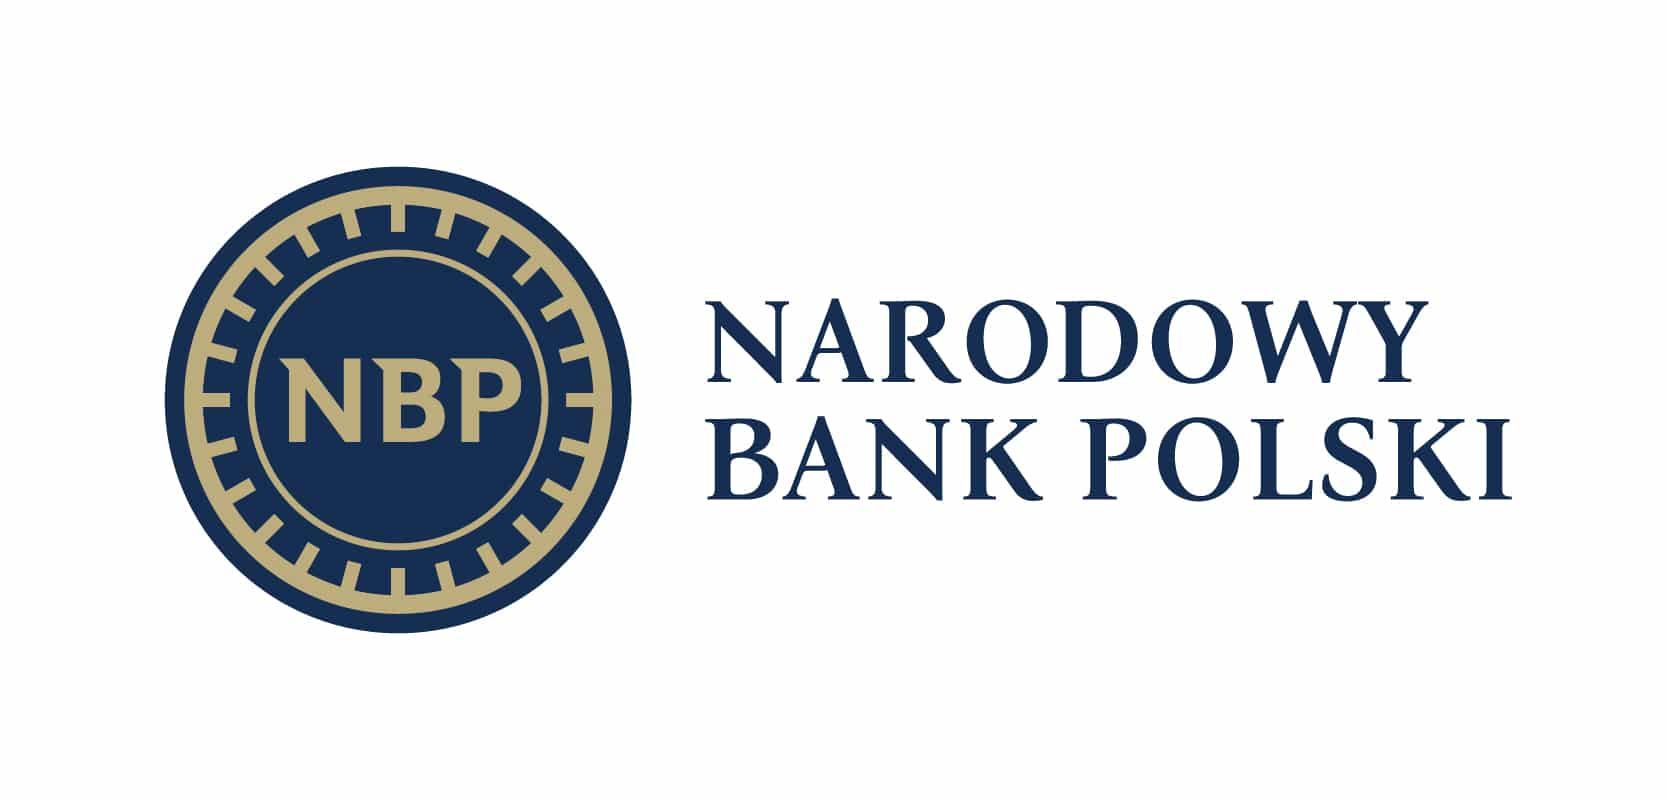 nowe logo NBP (6)